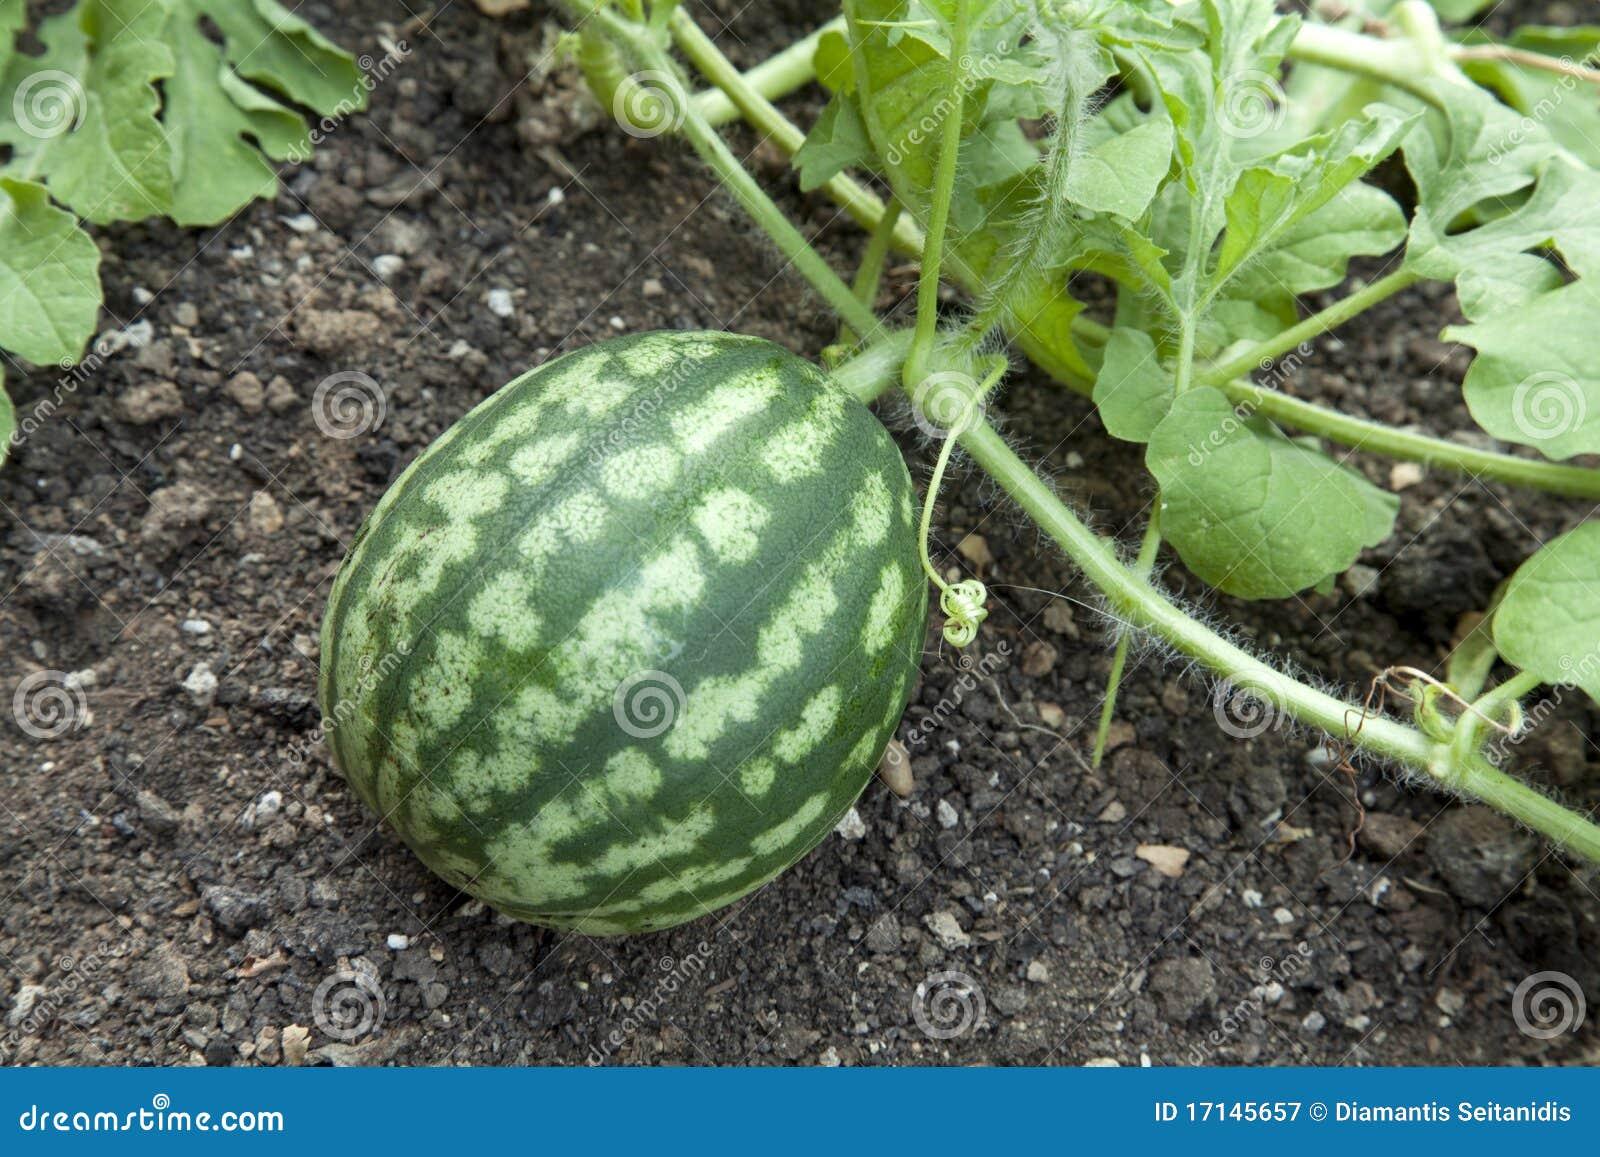 How Long Does Watermelon Last Shelf Life Storage Expiry